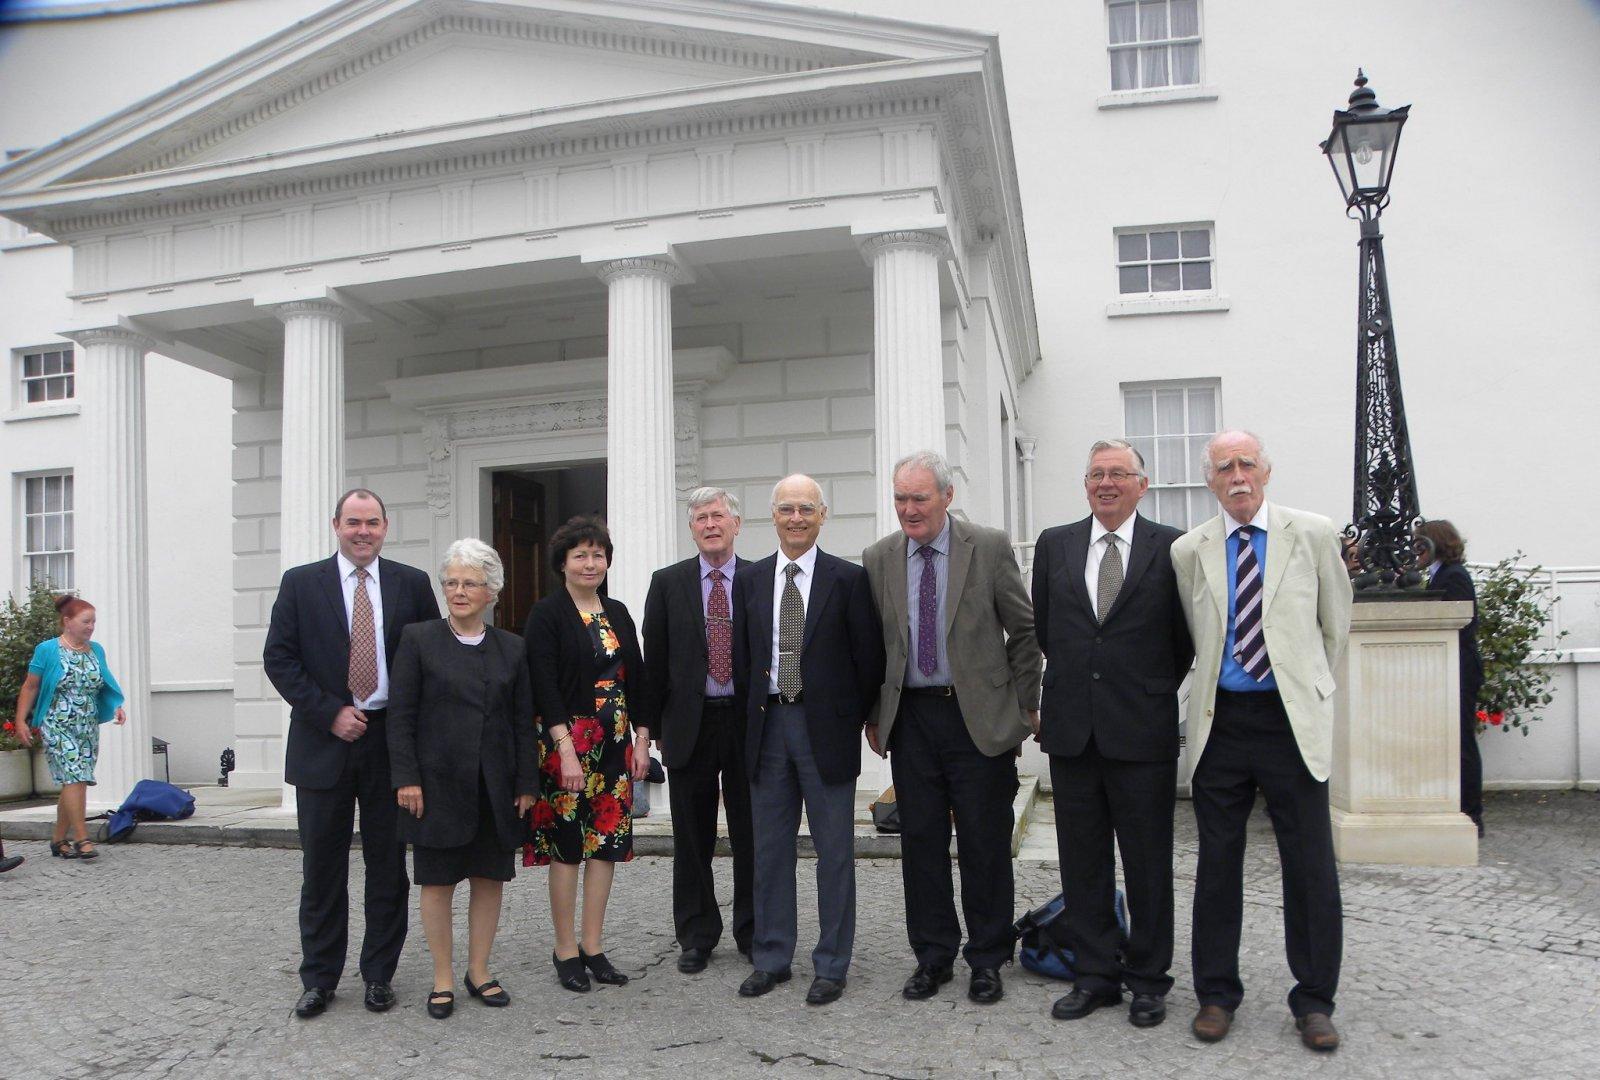 From left: Roddy Hegarty, Doreen McBride, Martina Griffin, Frank Taffe, Dick Ryan, John Dooher, John Hulme and Larry Breen